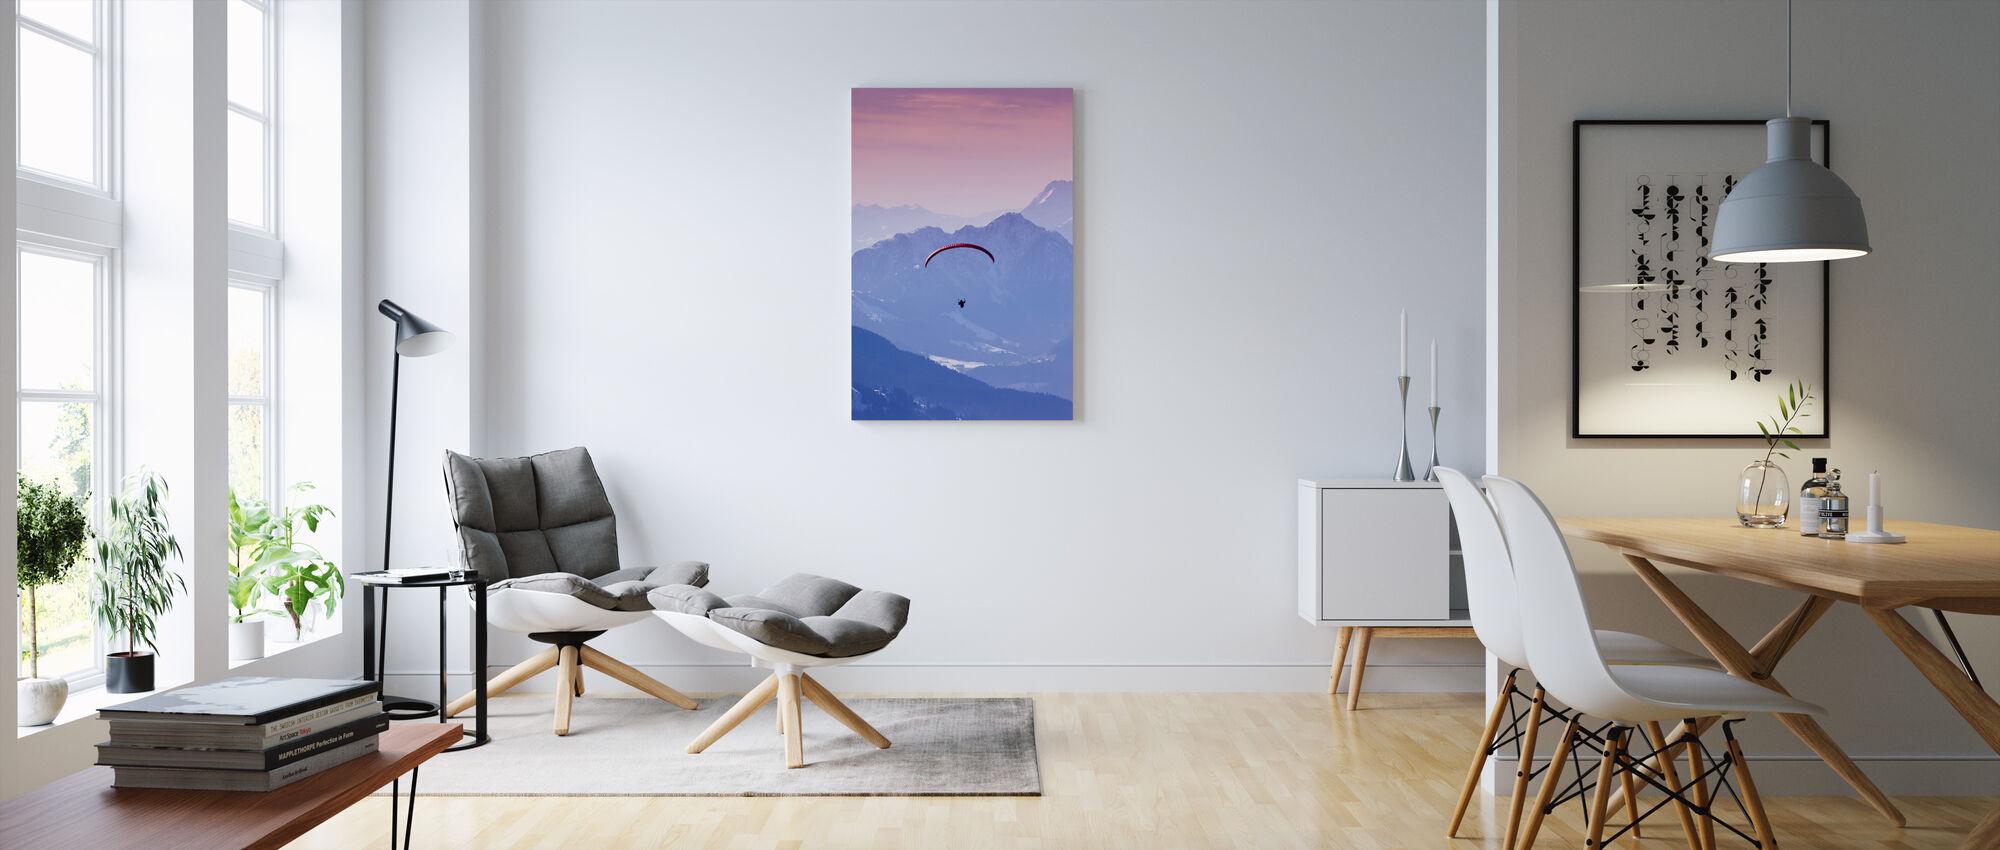 Kite in Hopfgarten, Austria - Canvas print - Living Room